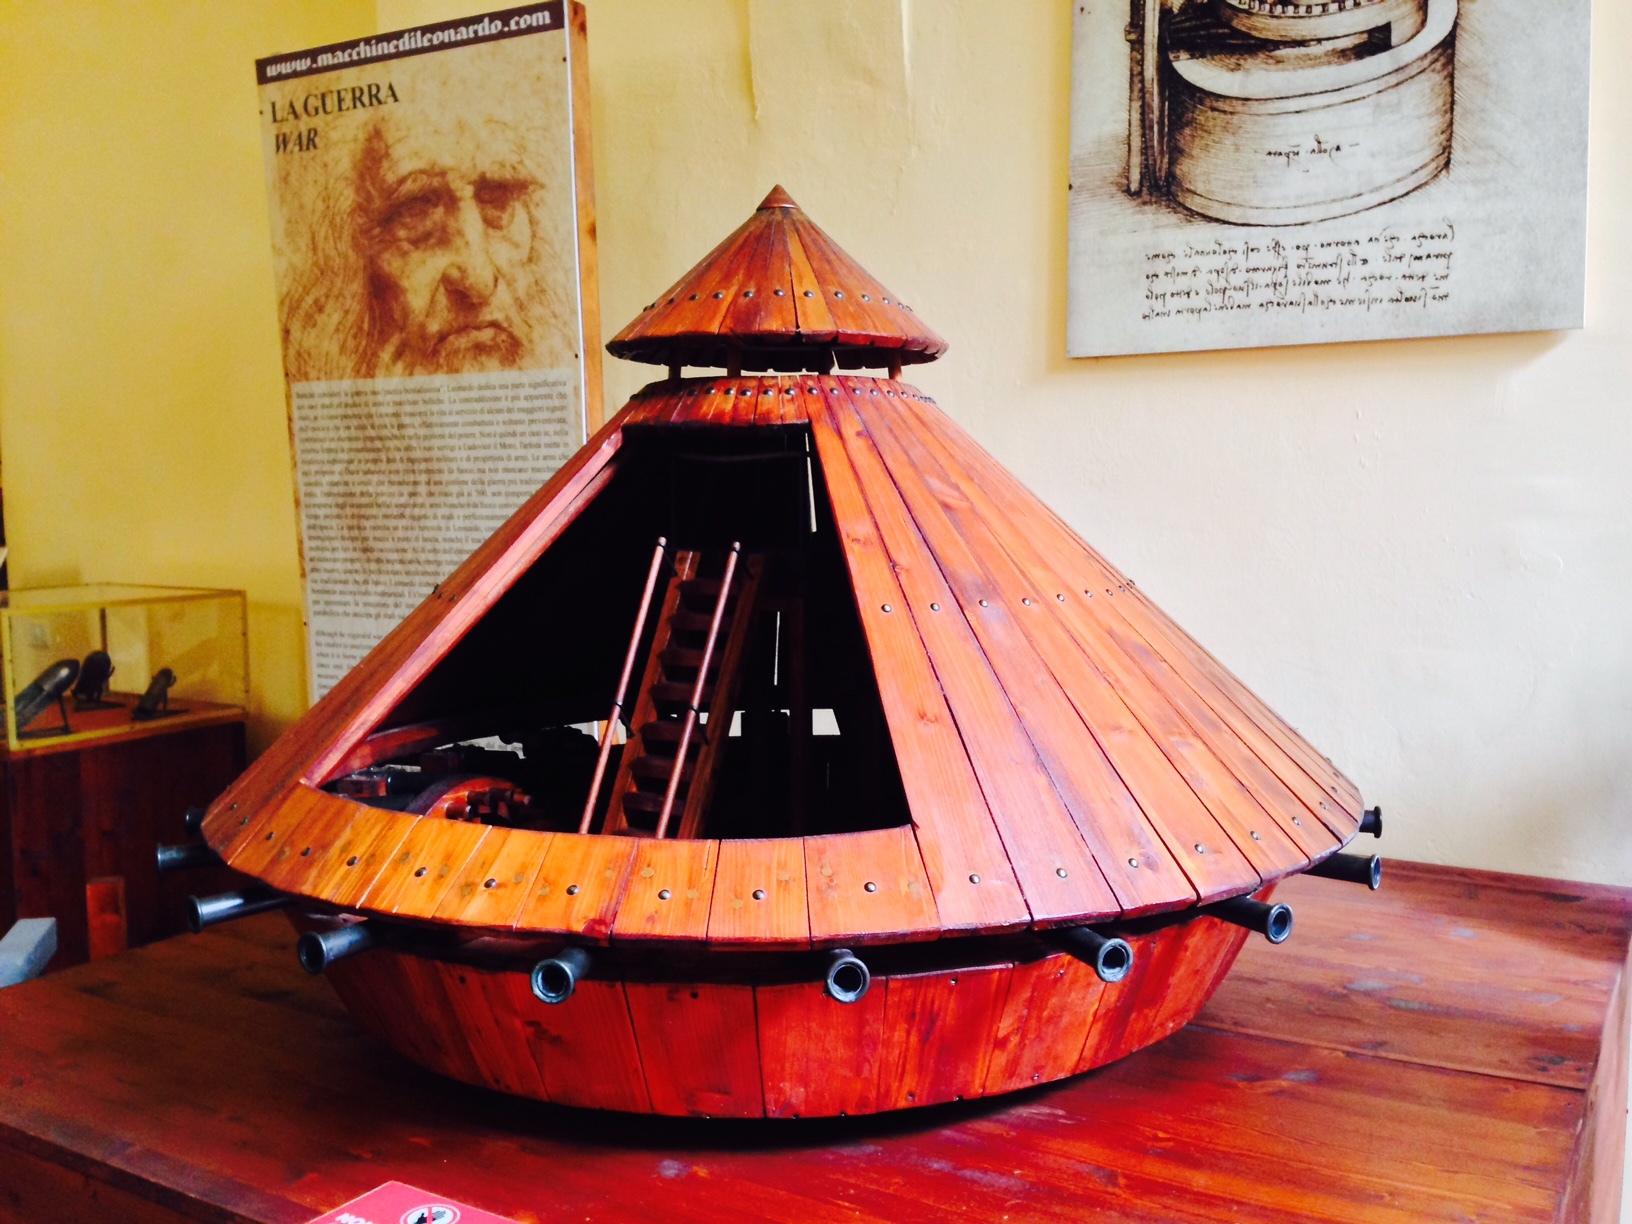 Museo Leonardo da Vinci Firenze lo conoscete?